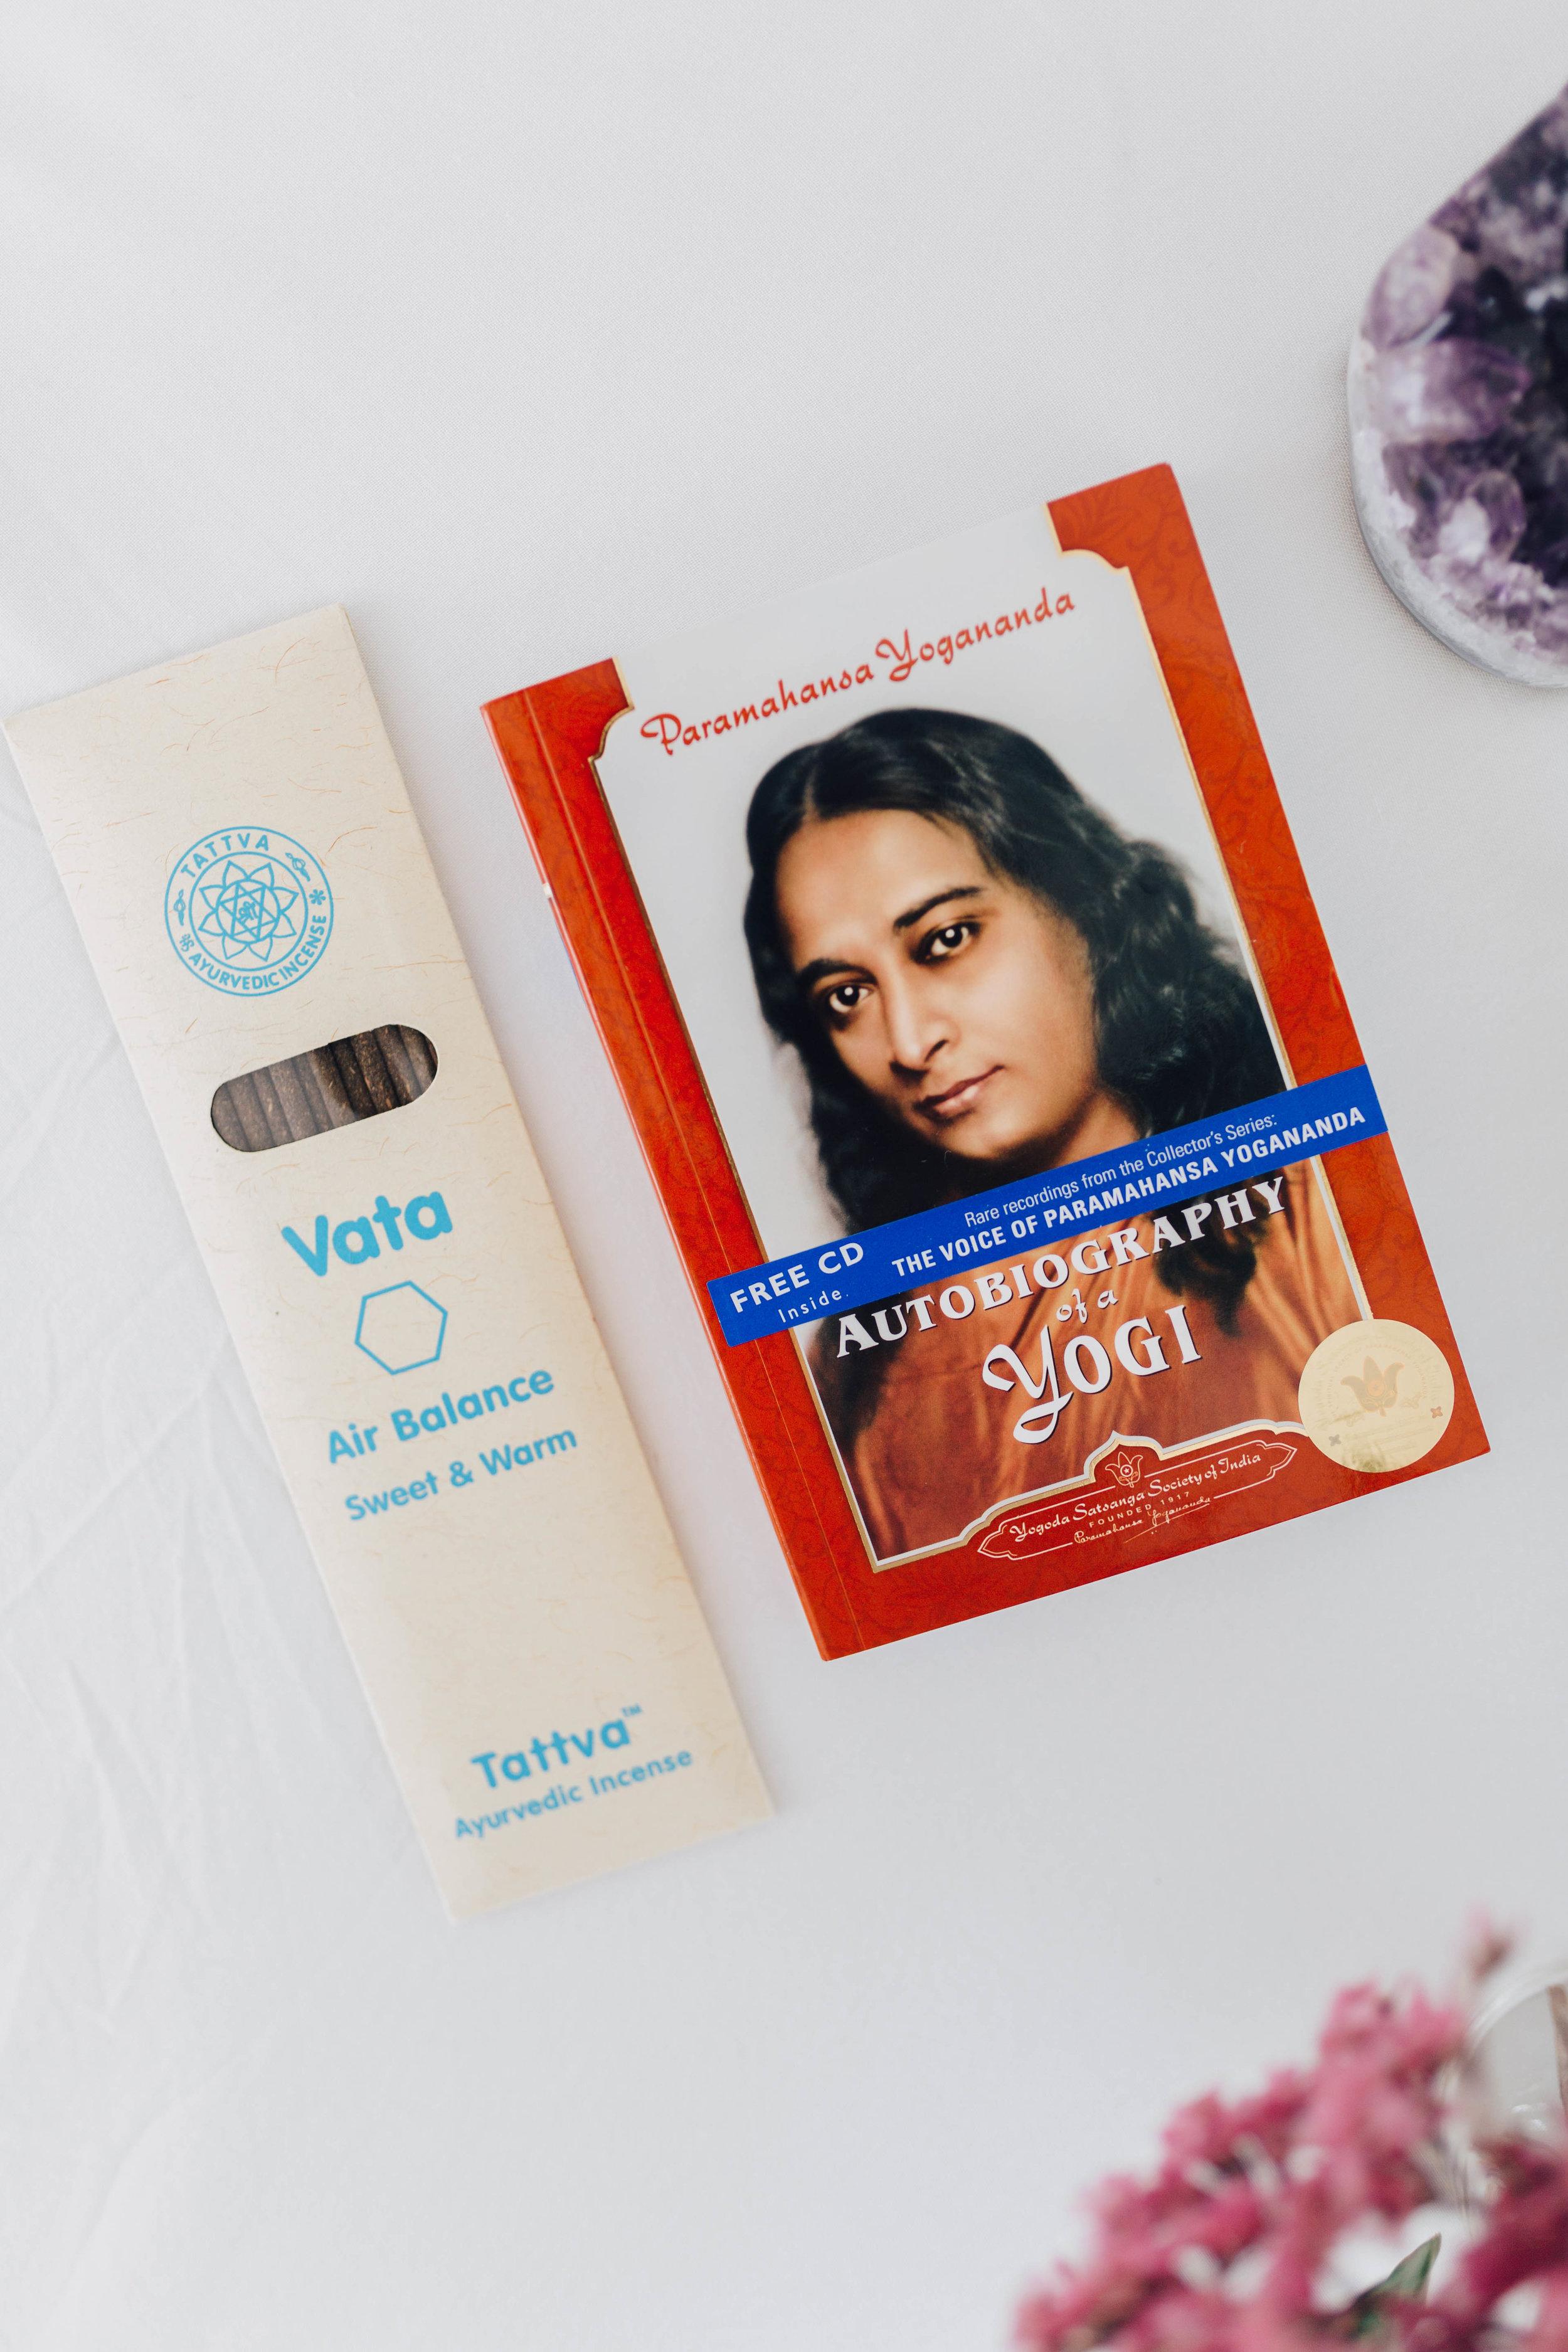 --- $25 gift ---- + ''Autobiography of a Yogi' book + Vata incense